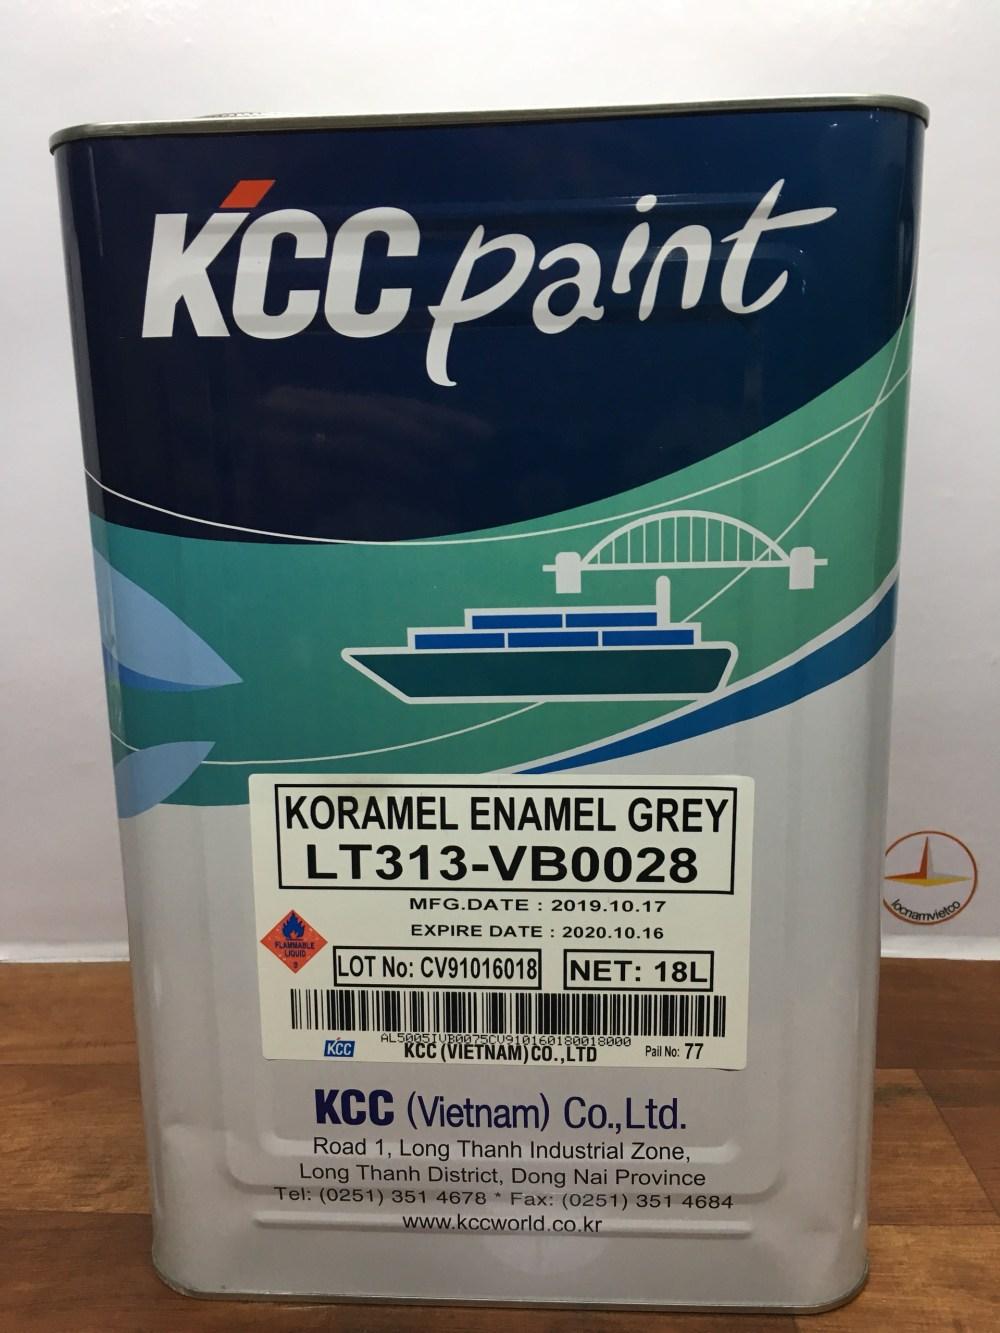 KORAMEL ENAMEL GREY LT313-VB0028 -18L (2)